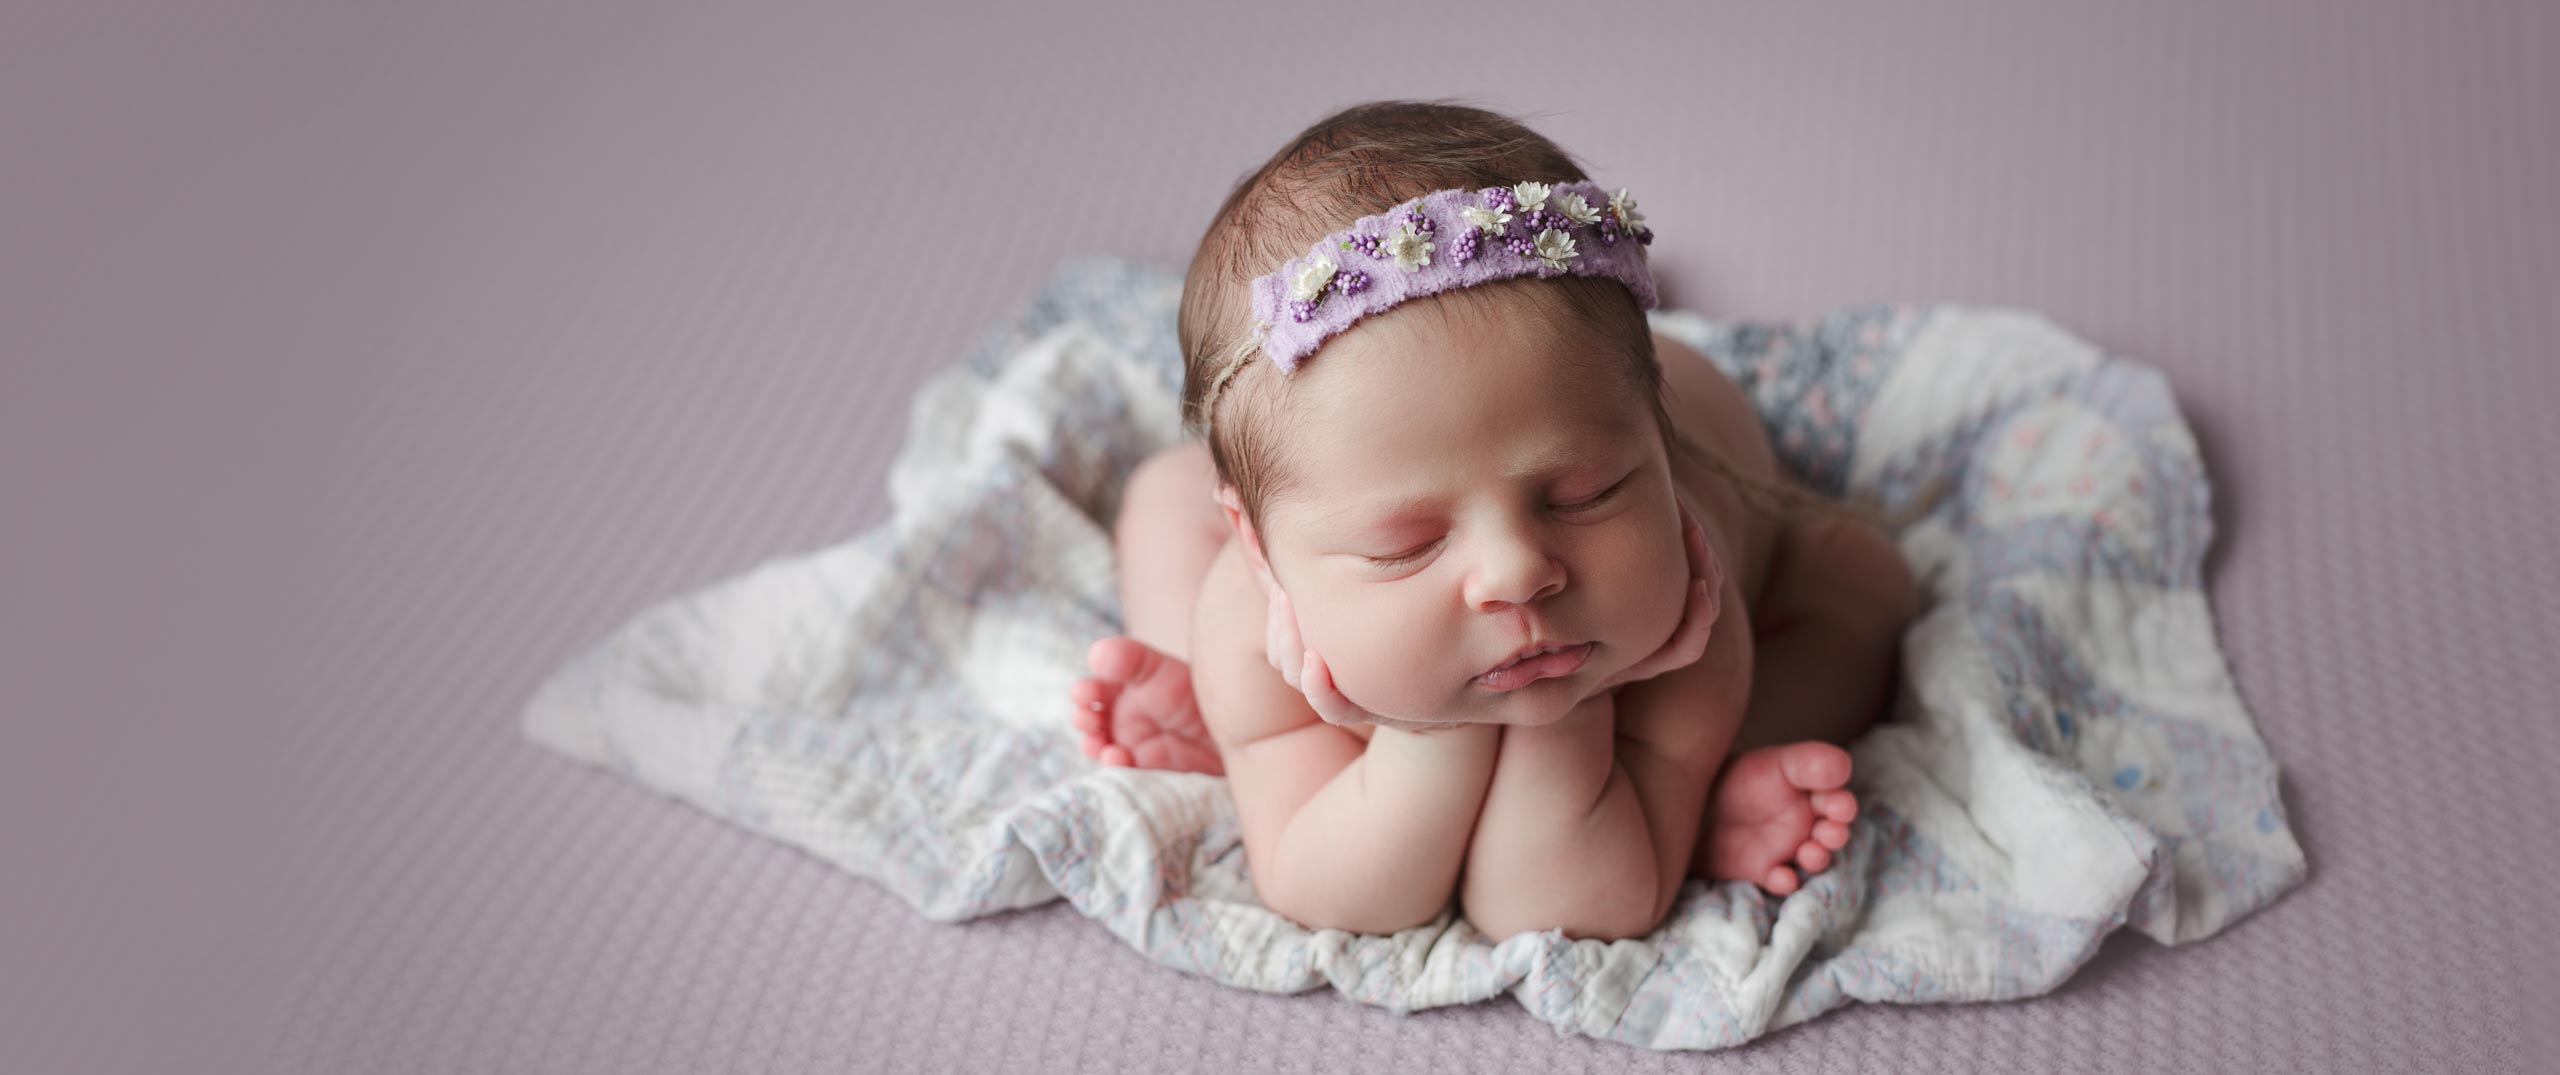 Top Newborn Baby Photographer Lincoln Ne